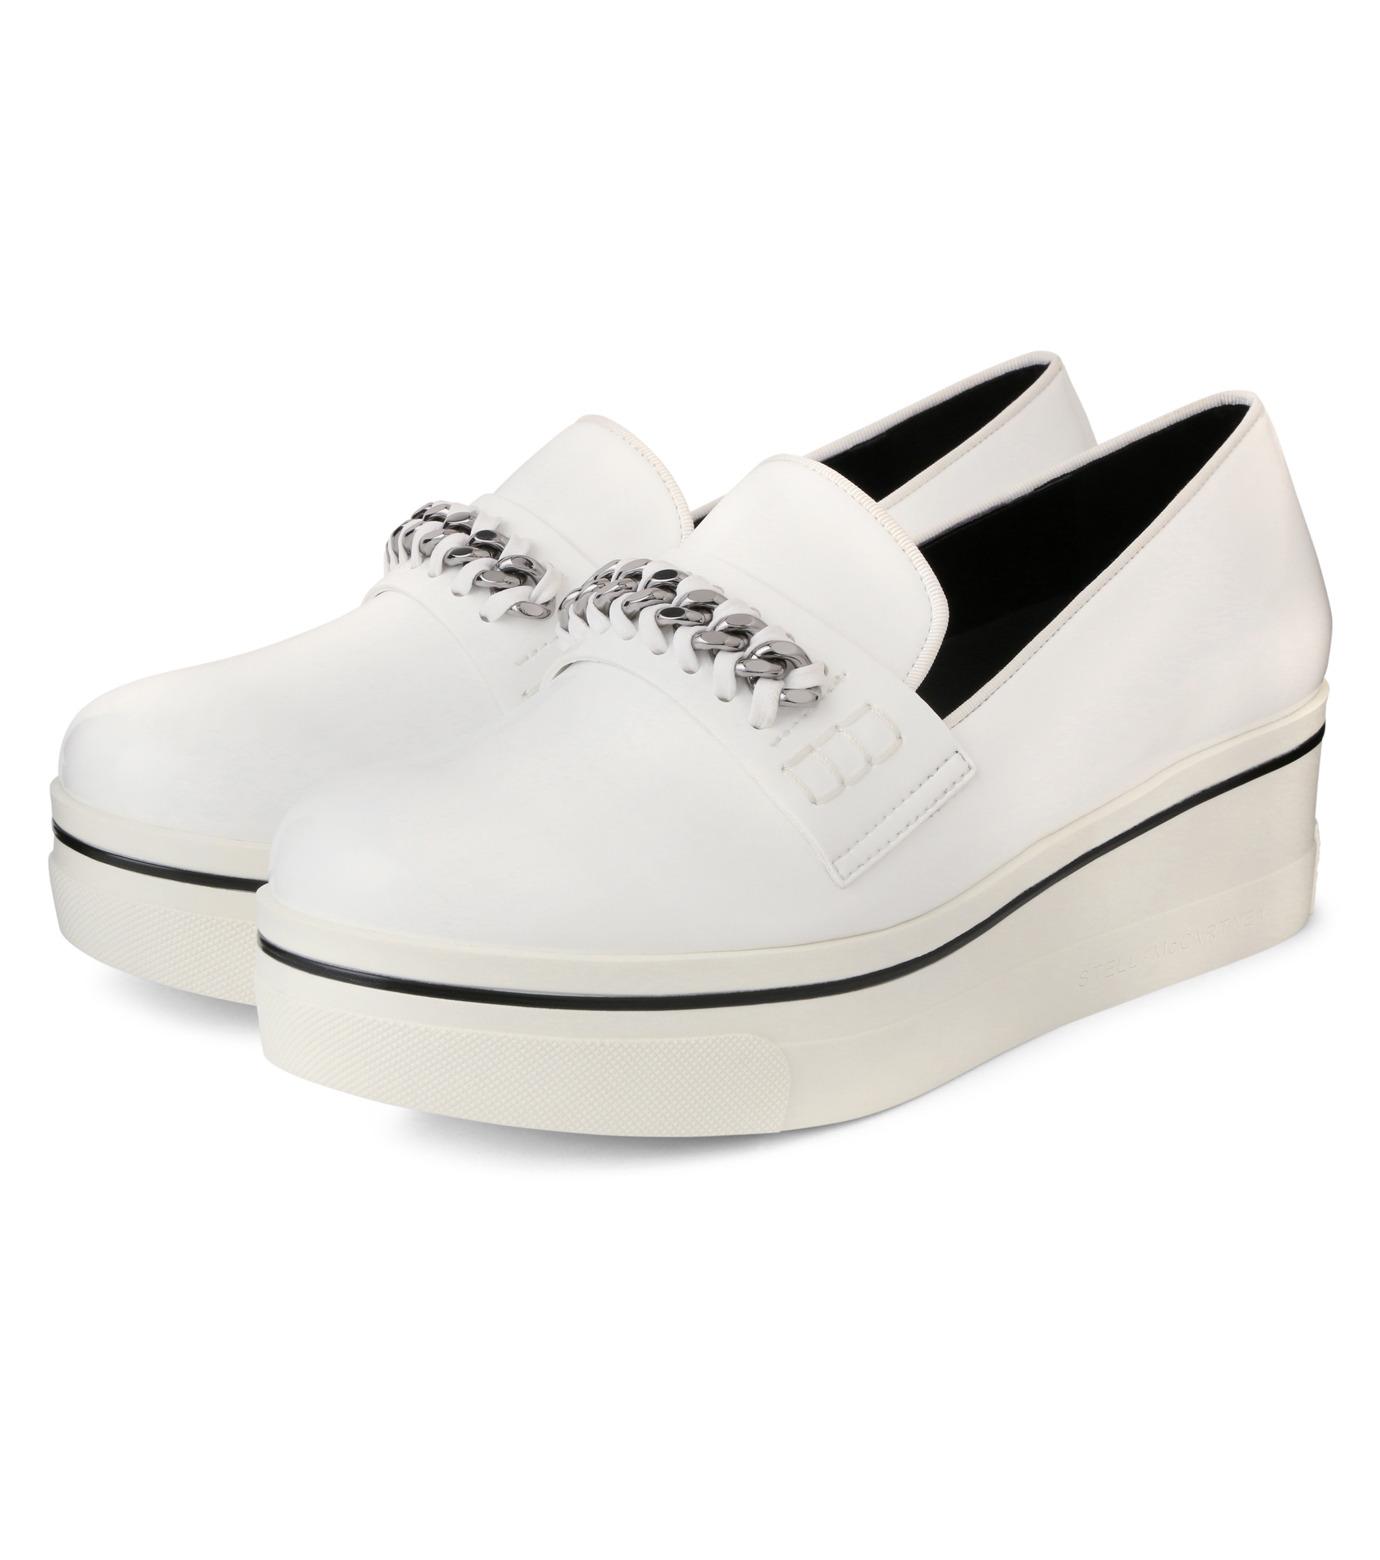 Stella McCartney(ステラマッカートニー)のBinx Sneaker-WHITE(スニーカー/sneaker)-392315-W0VE2-4 拡大詳細画像3